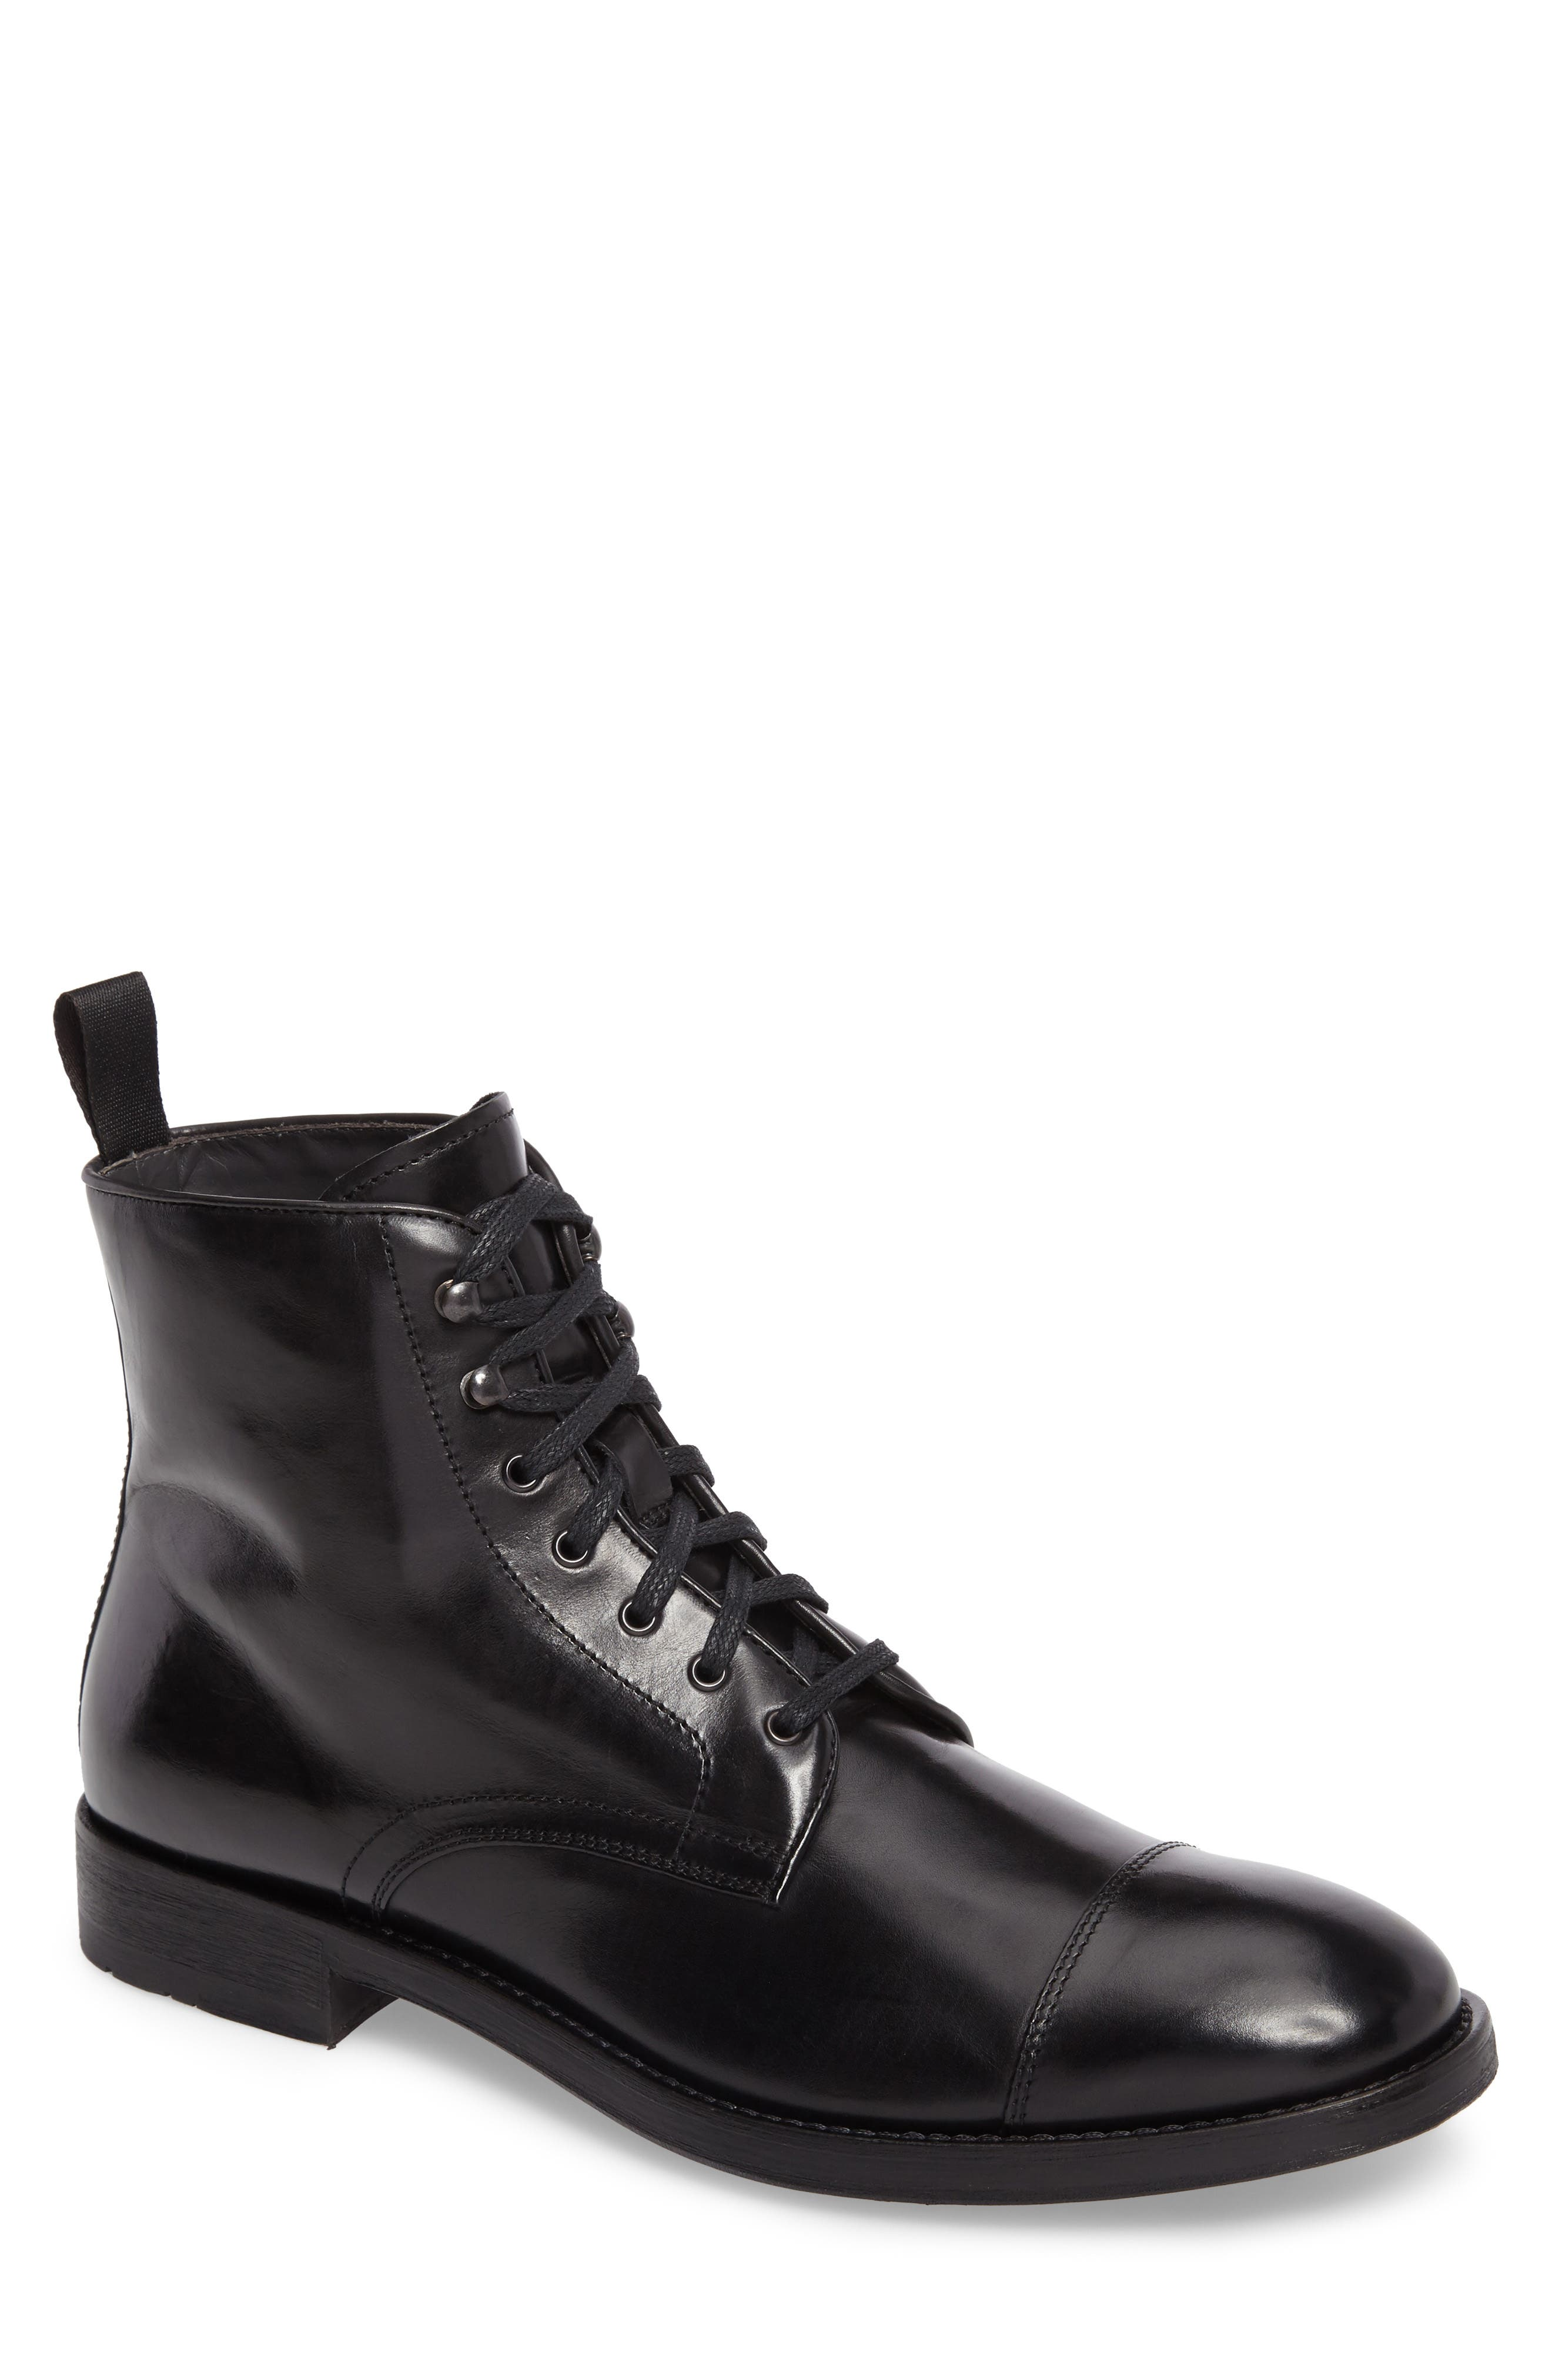 Bondfield Cap Toe Boot,                         Main,                         color, Black